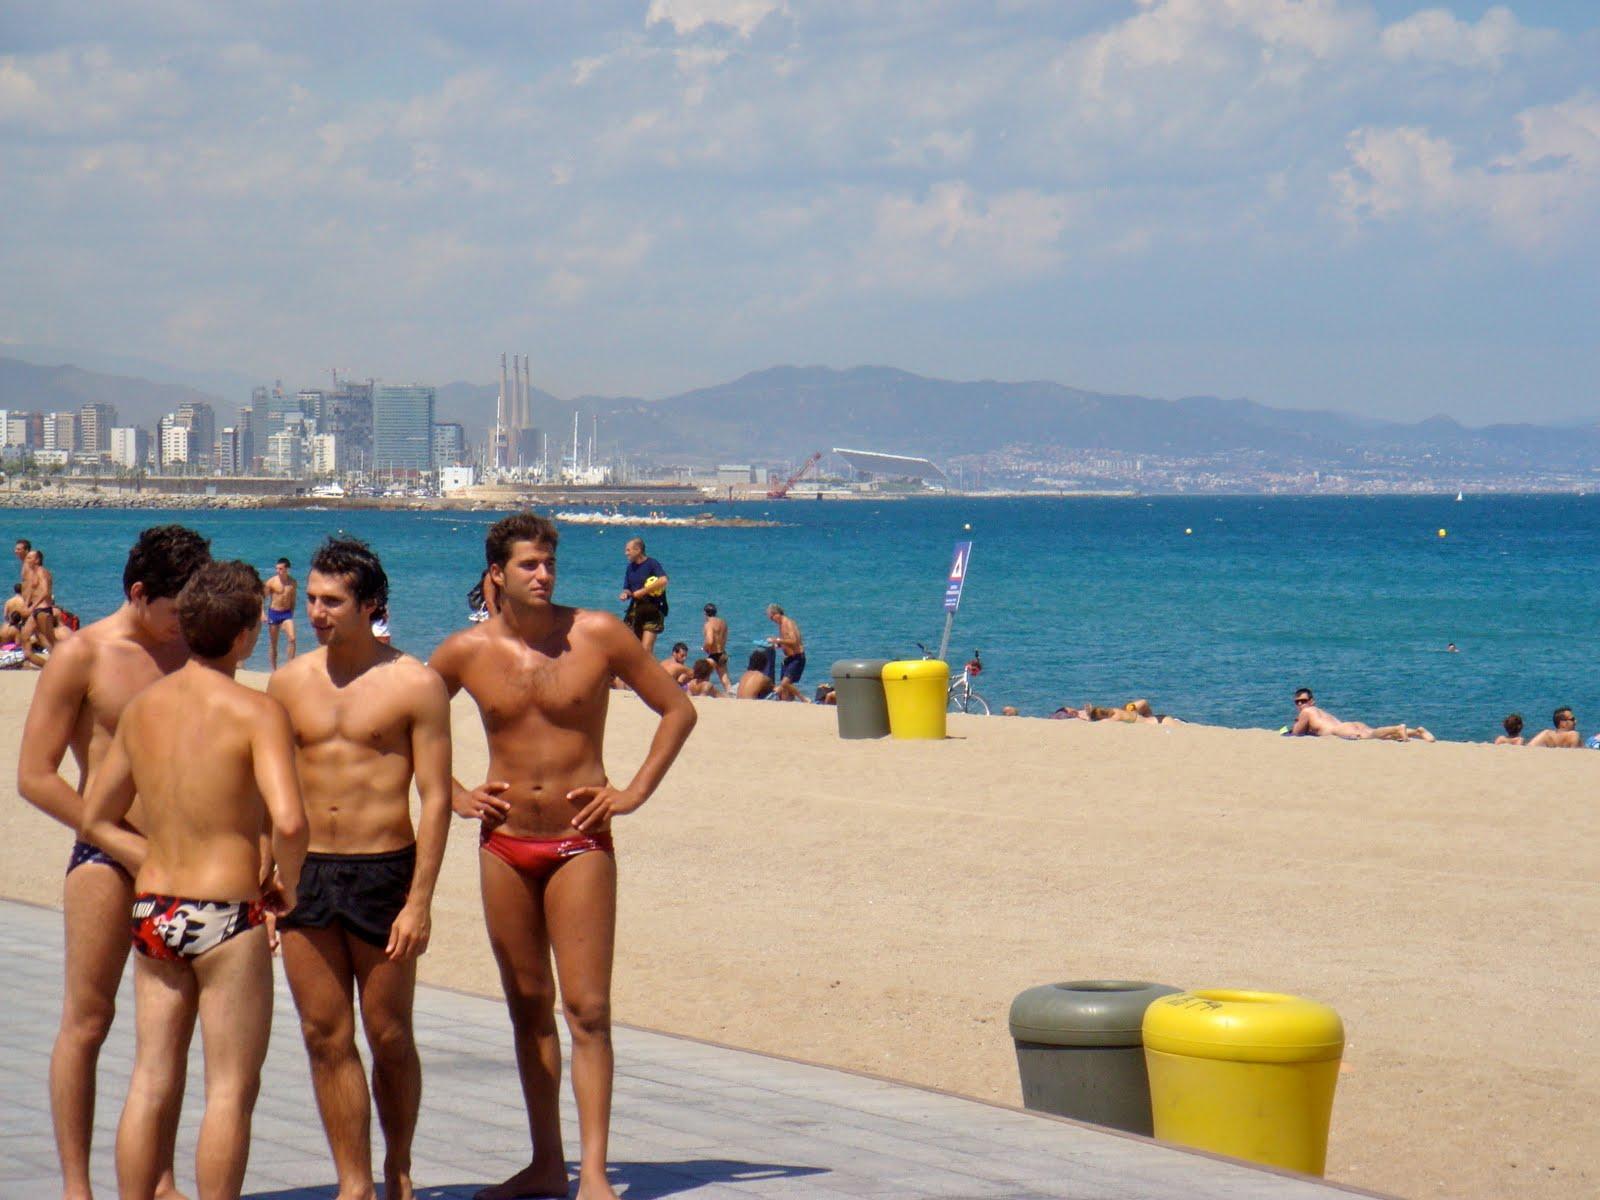 Фото с гей пляжей фото 467-35